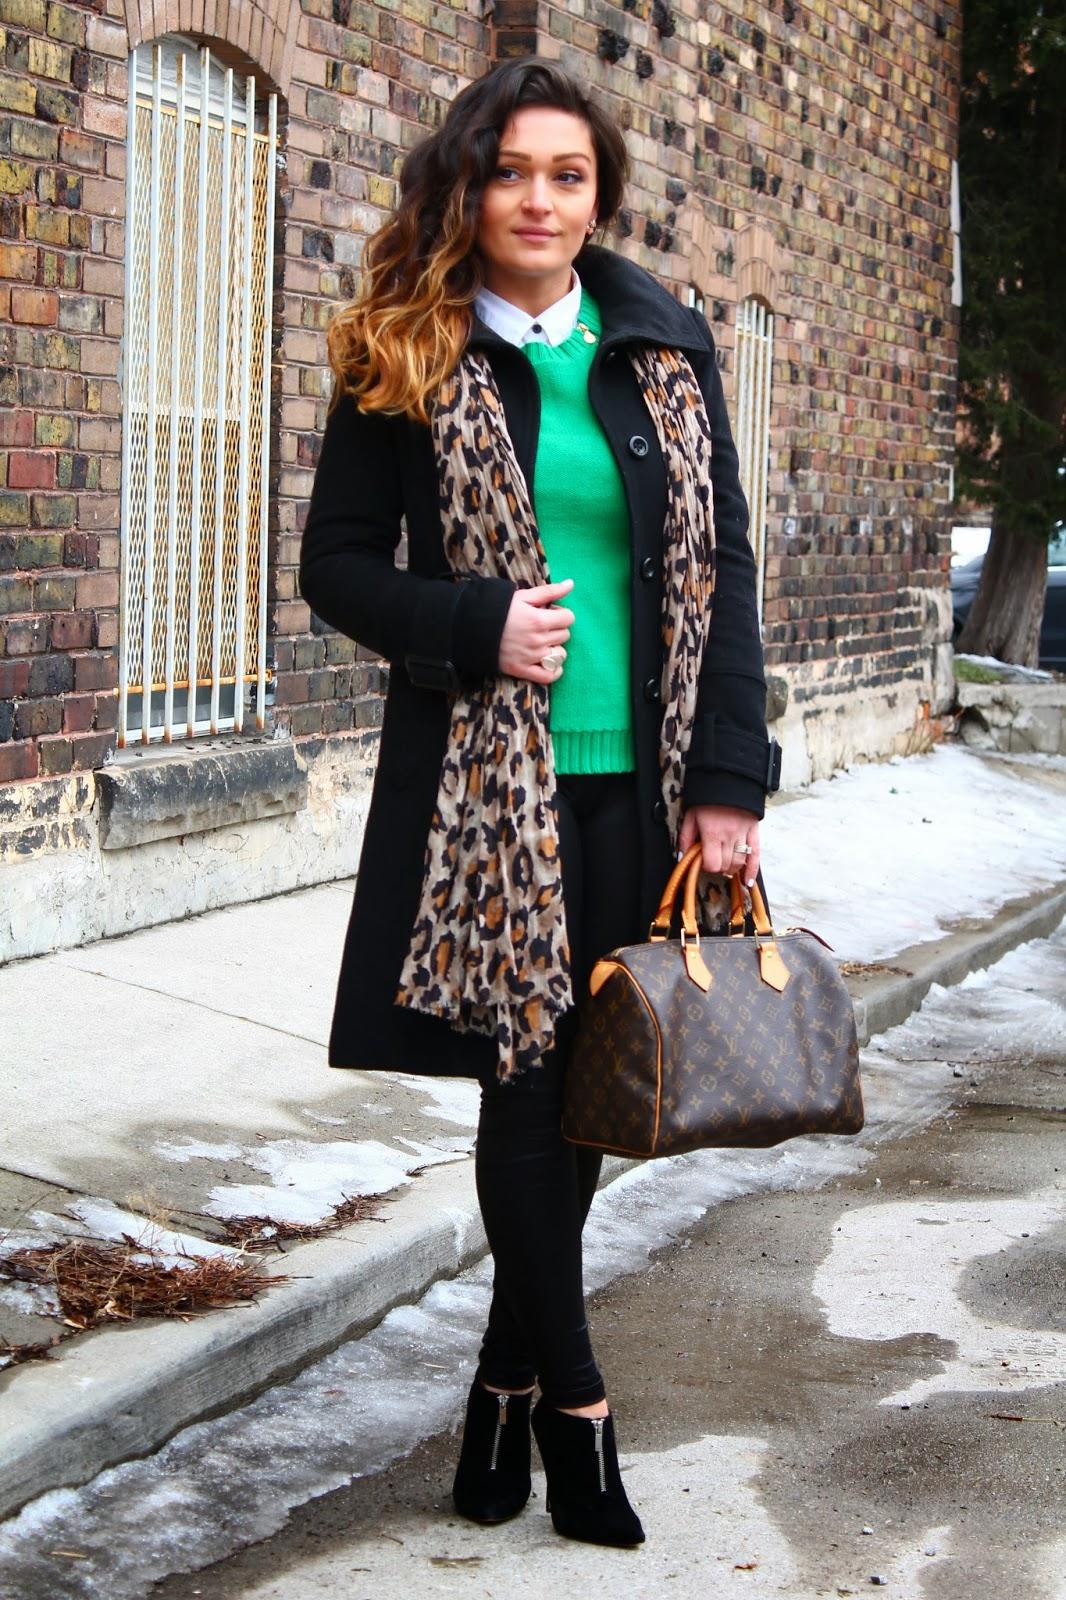 #aldo #aldoboots #ankleboots #boots #suedeboots #leather #party #fashion #streetstyle #toronto #canada #fashionblogger #canadianfashionblogger #serbianfashionblogger #outfit #ootd #trend #hotblogger #bestblogger #topblogger #topfashionblogger #fur #leather #torontostreetstyle #torontofashion #torontoblogger #topcanadianblogger #canadianfashion #srpksablogerka #srpskeblogerke #moda #stil #srkpskamoda #topblogger #bestblogger #bestcanadianblogger #ukblogger #ukbloggers #bestukbloggers #hm #h&M #sweater #annekleinsweater #jacob #jackobcoat #printjacket #danierleather #louisvuitton #louisvuittonspeedy #speedy #monogramspeedy #leatherbag #leathersatchel #philiplim #ottawa #Ontario #ontarioblogger #urbanbehavior #urbanplanet #bestofstreetstyle #beststreetstyle #furcoat #stripes #stripedsweather #layering #layeringclothes #joefresh #canadiandesigner #forever21 #forever21sweater #fur #popofcolour #brightoutfit #cobaltblue #cobaltbluenecklace #royalblue #royalbluenecklace #statementnecklace #furcollar #furcollarcoat #chicisimo #chictopia #sashadollfashioncloset #sashadollfashion #sashadoll #michaelkors #michaelkorswatch #michaelkorsgoldwatch #laetherpants #leatherleggings #sneakers #guess #guesssneakers #emeraldnecklace #sportylook #sportskaelegancija #strippes #strippedsweater #urbanstyle #urnablook #lookbook #lookoftheday #outfitoftheday #cooloutfit #anneklein #greensweater #emeraldgreensweater